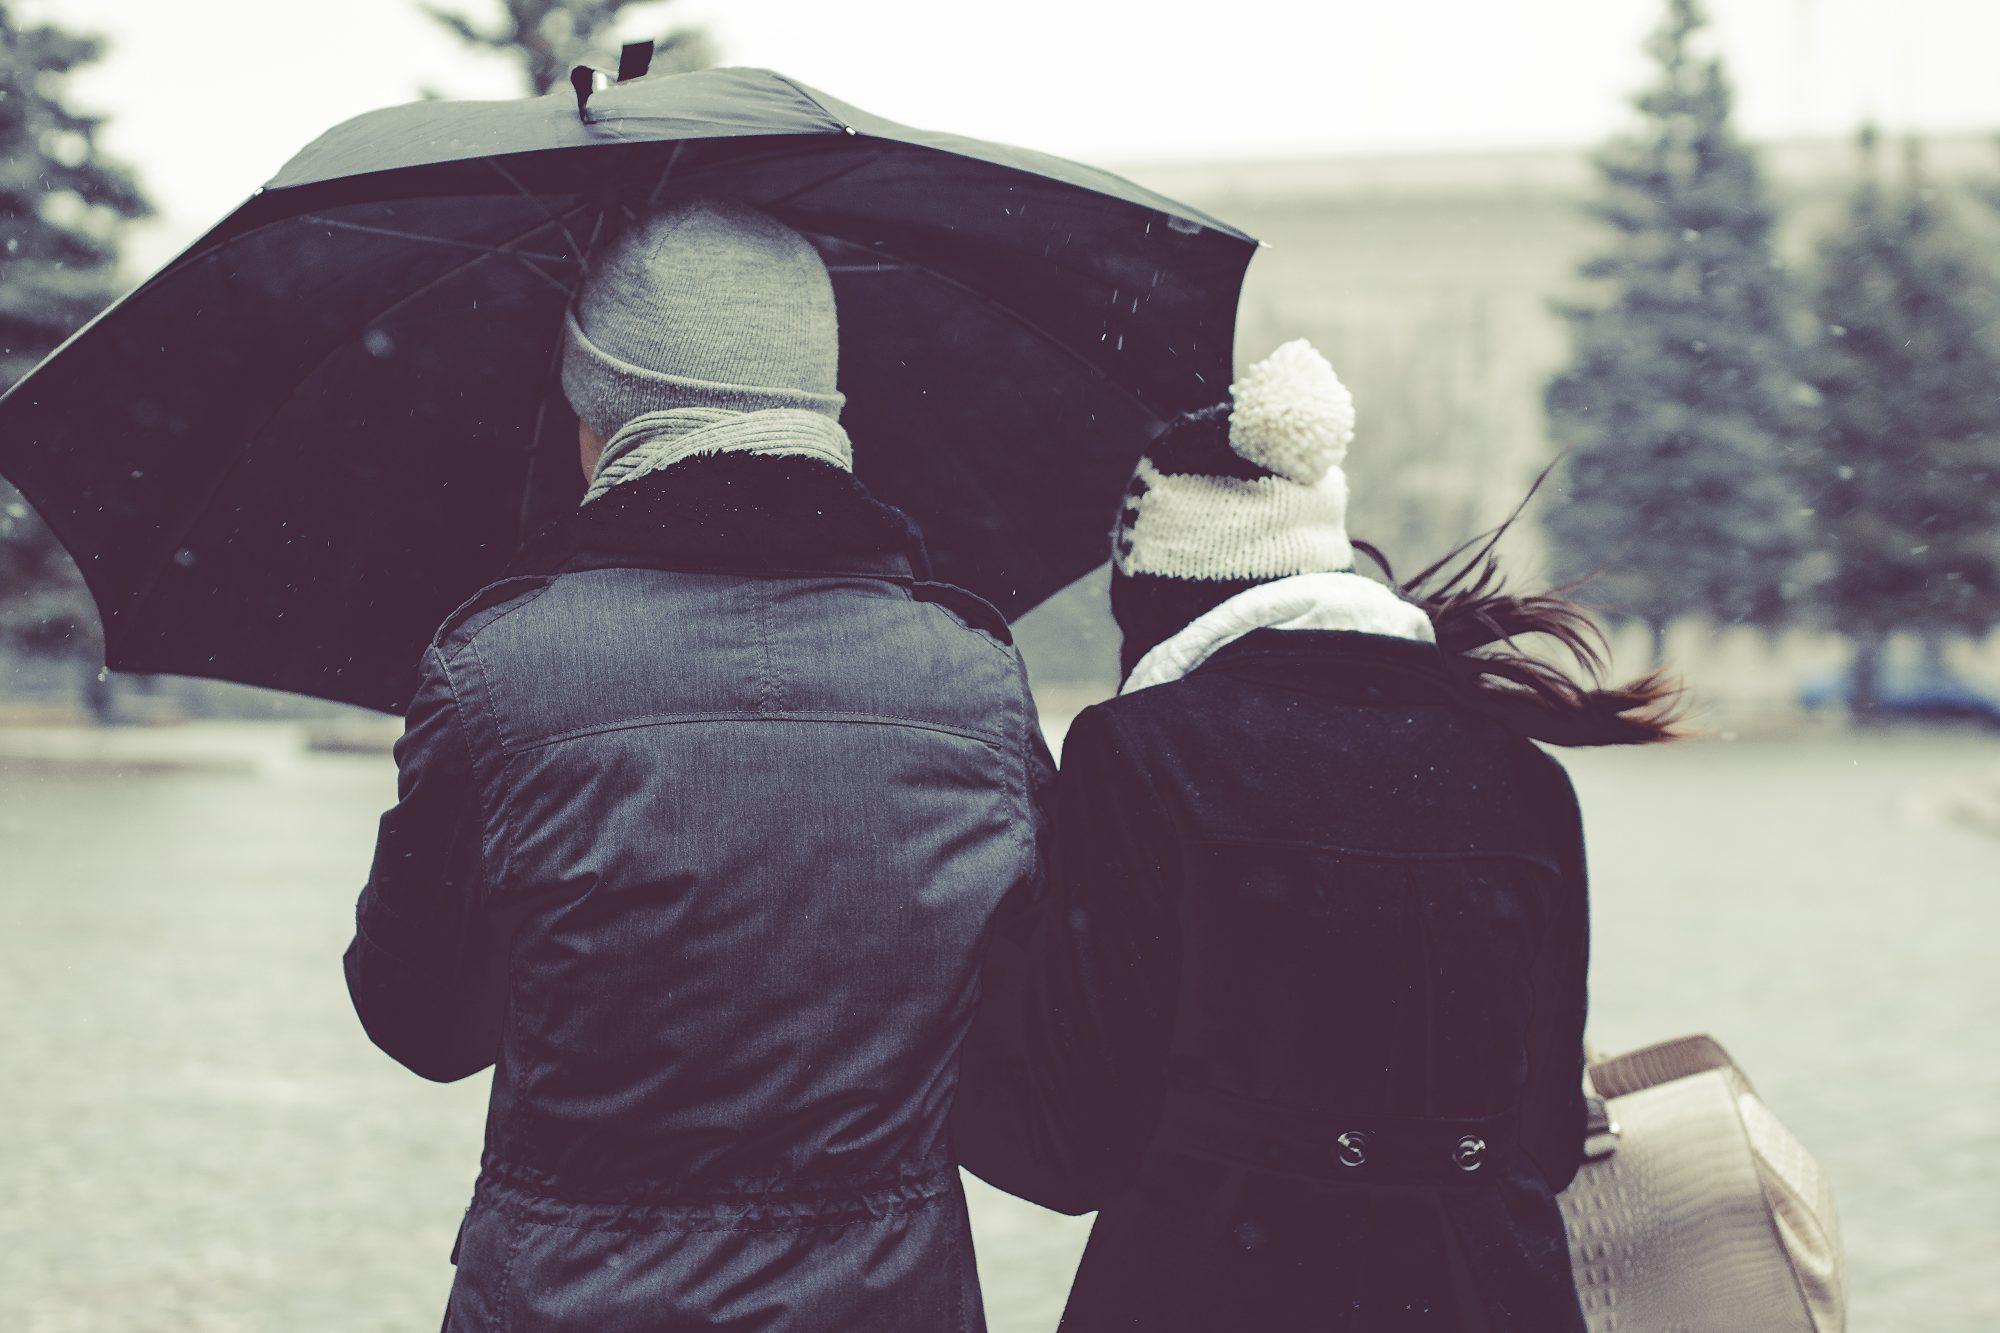 couple umbrella